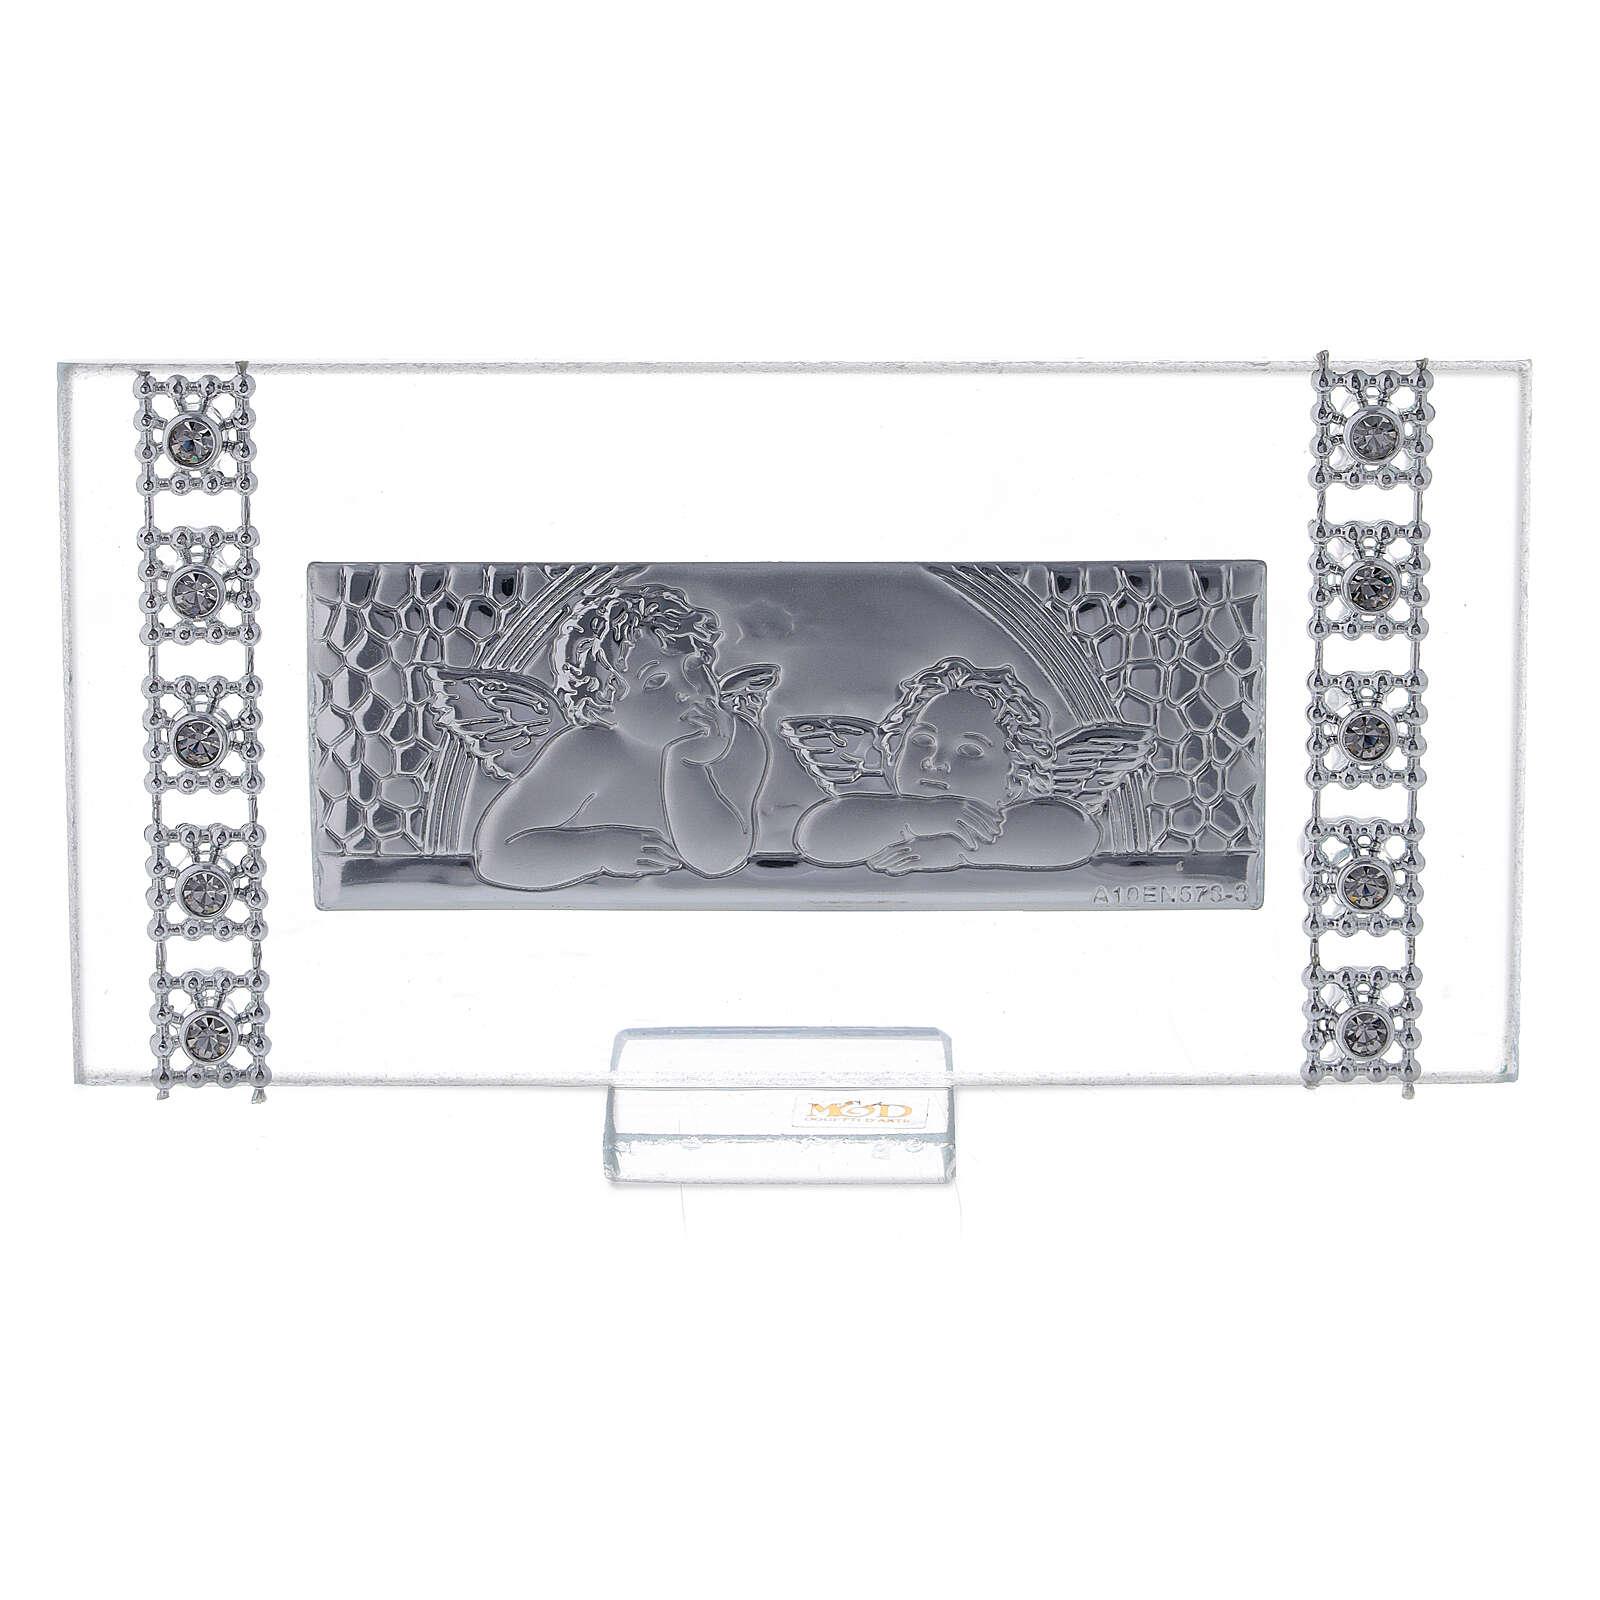 Lembrancinha quadro rectangular batismo 3